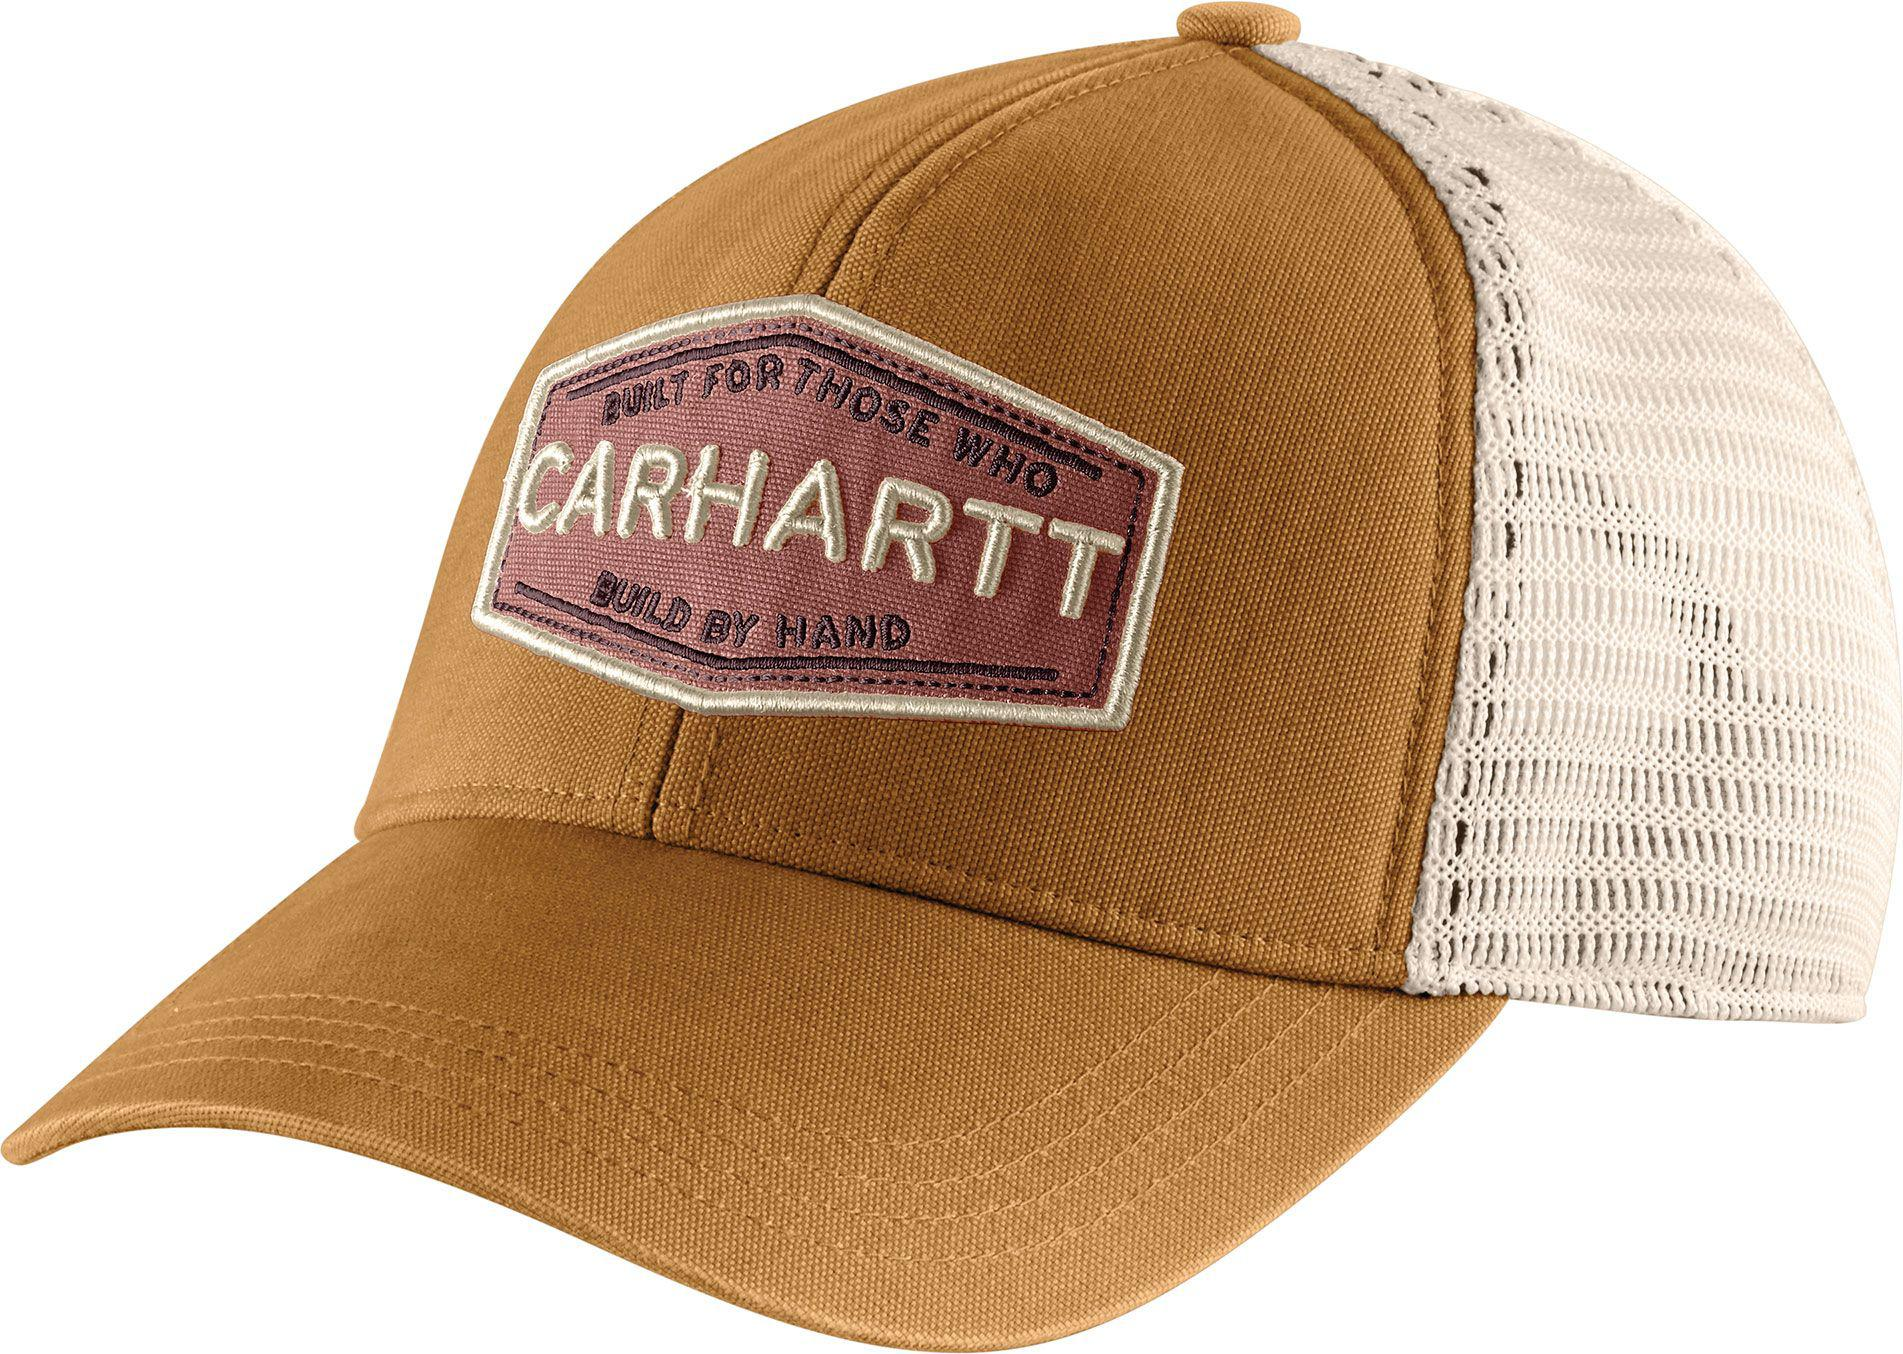 0e810a9420b Lyst - Carhartt Ellaire Built By Hand Trucker Hat in Brown